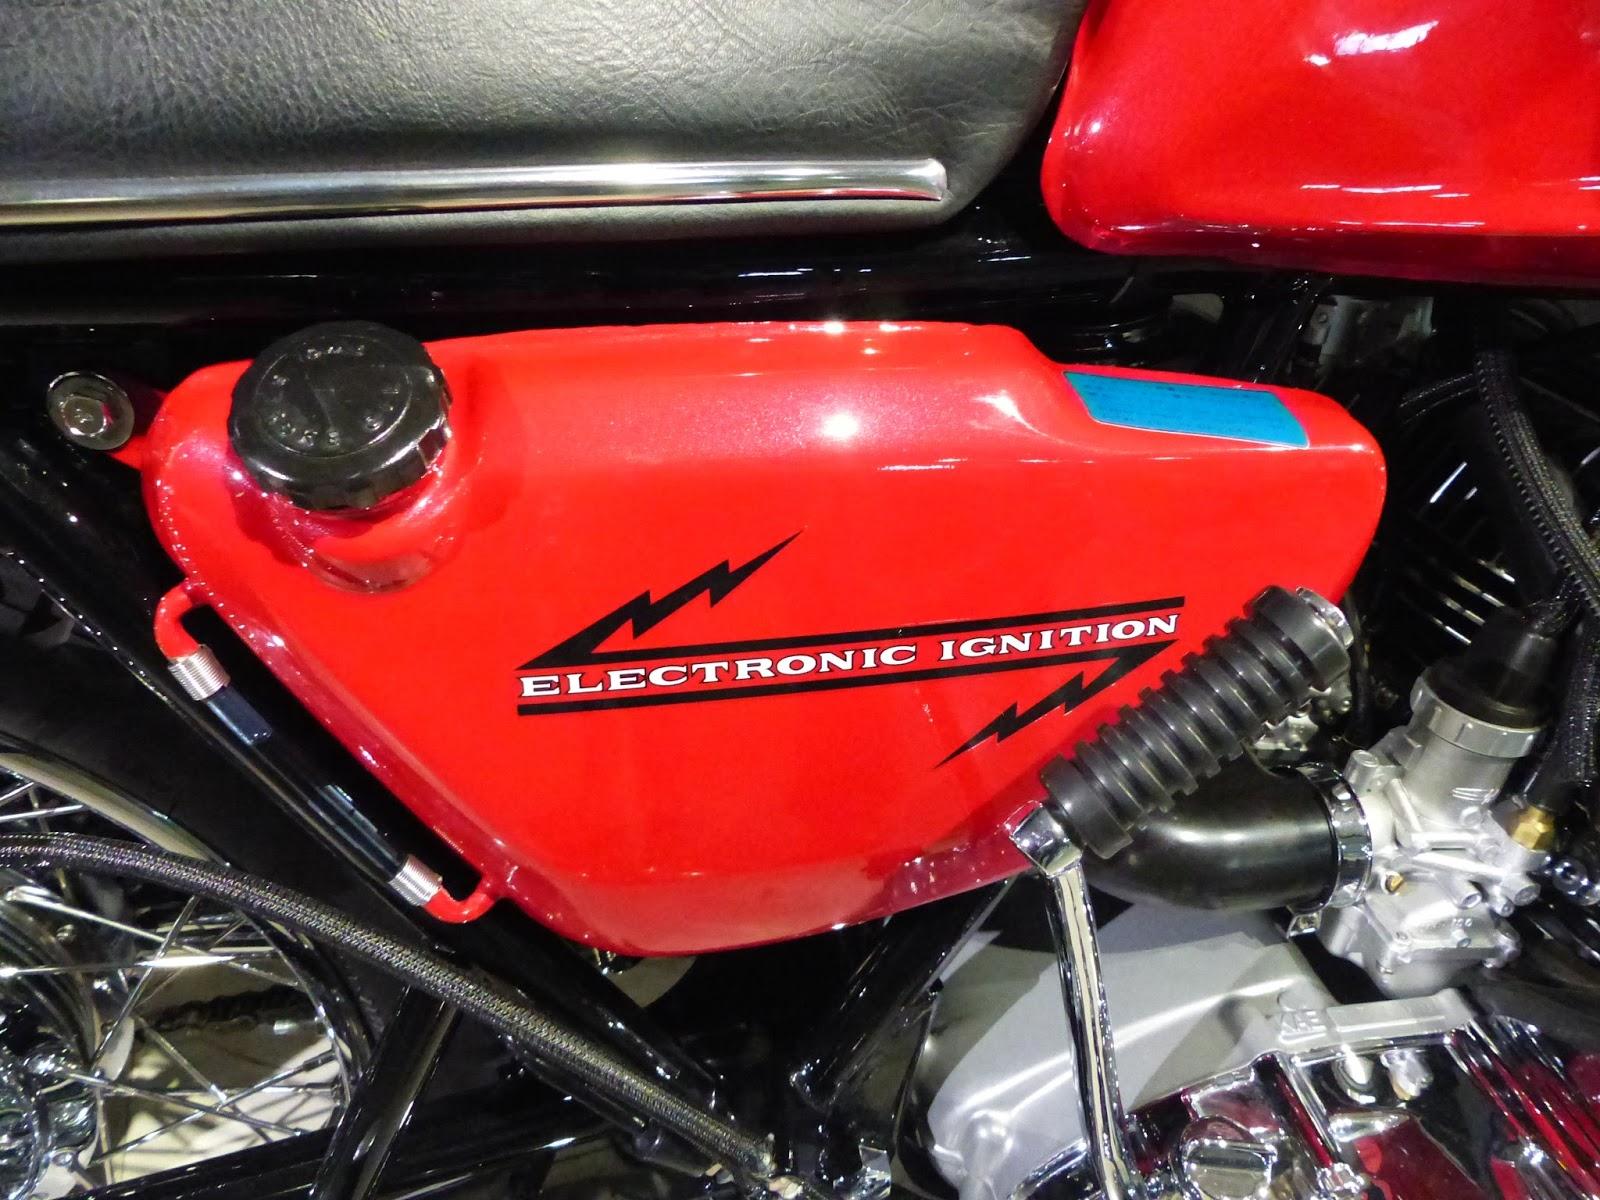 OldMotoDude: 1970 Kawasaki H1 500 Triple on display at the